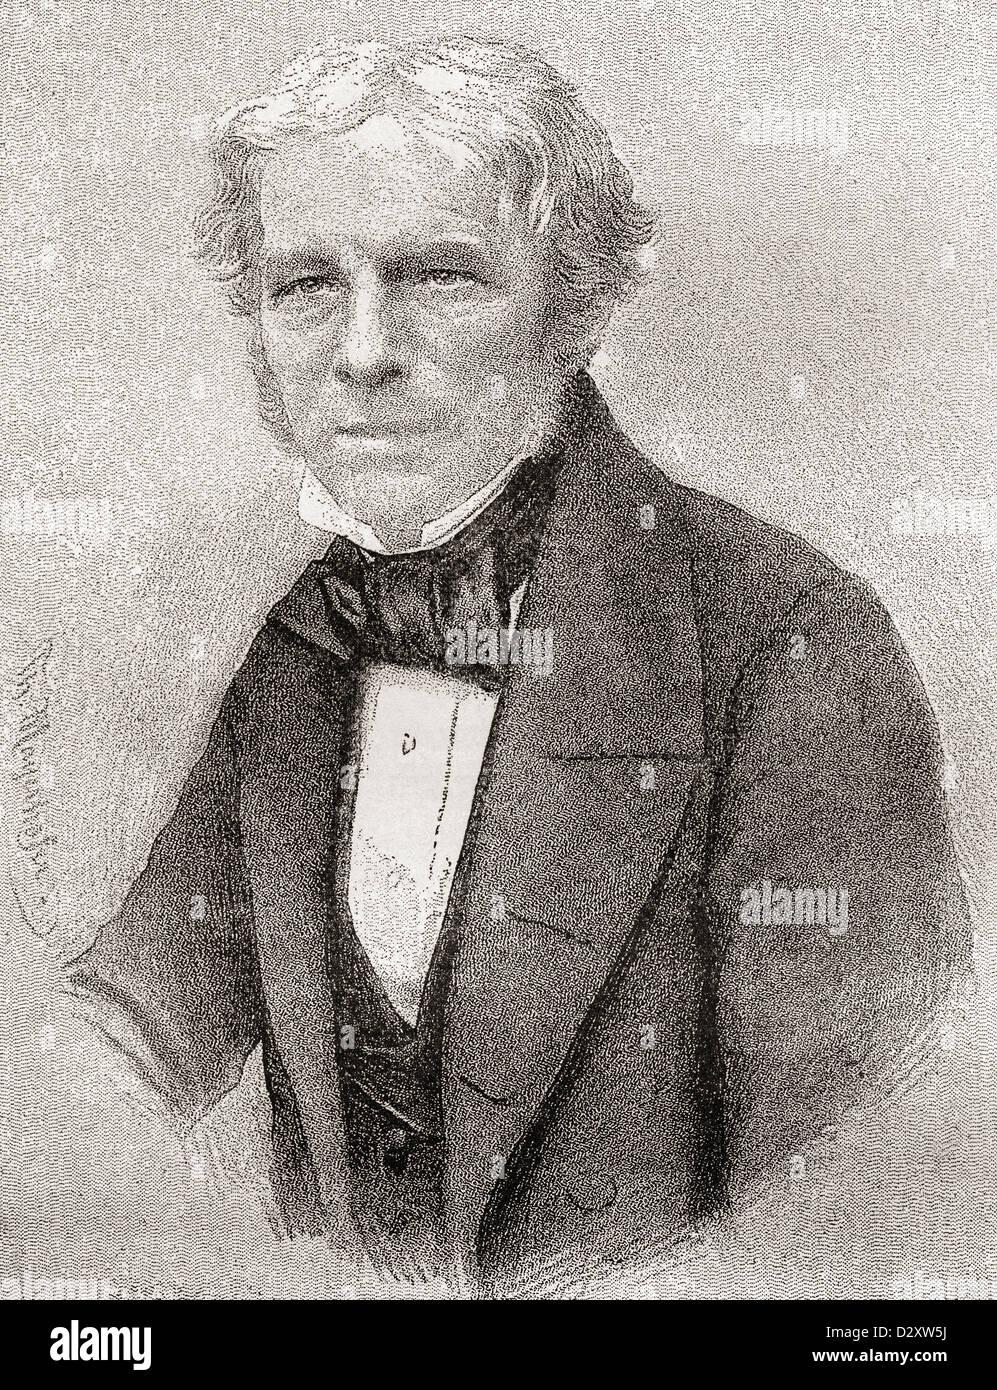 Michael Faraday, 1791 –1867. English scientist. - Stock Image